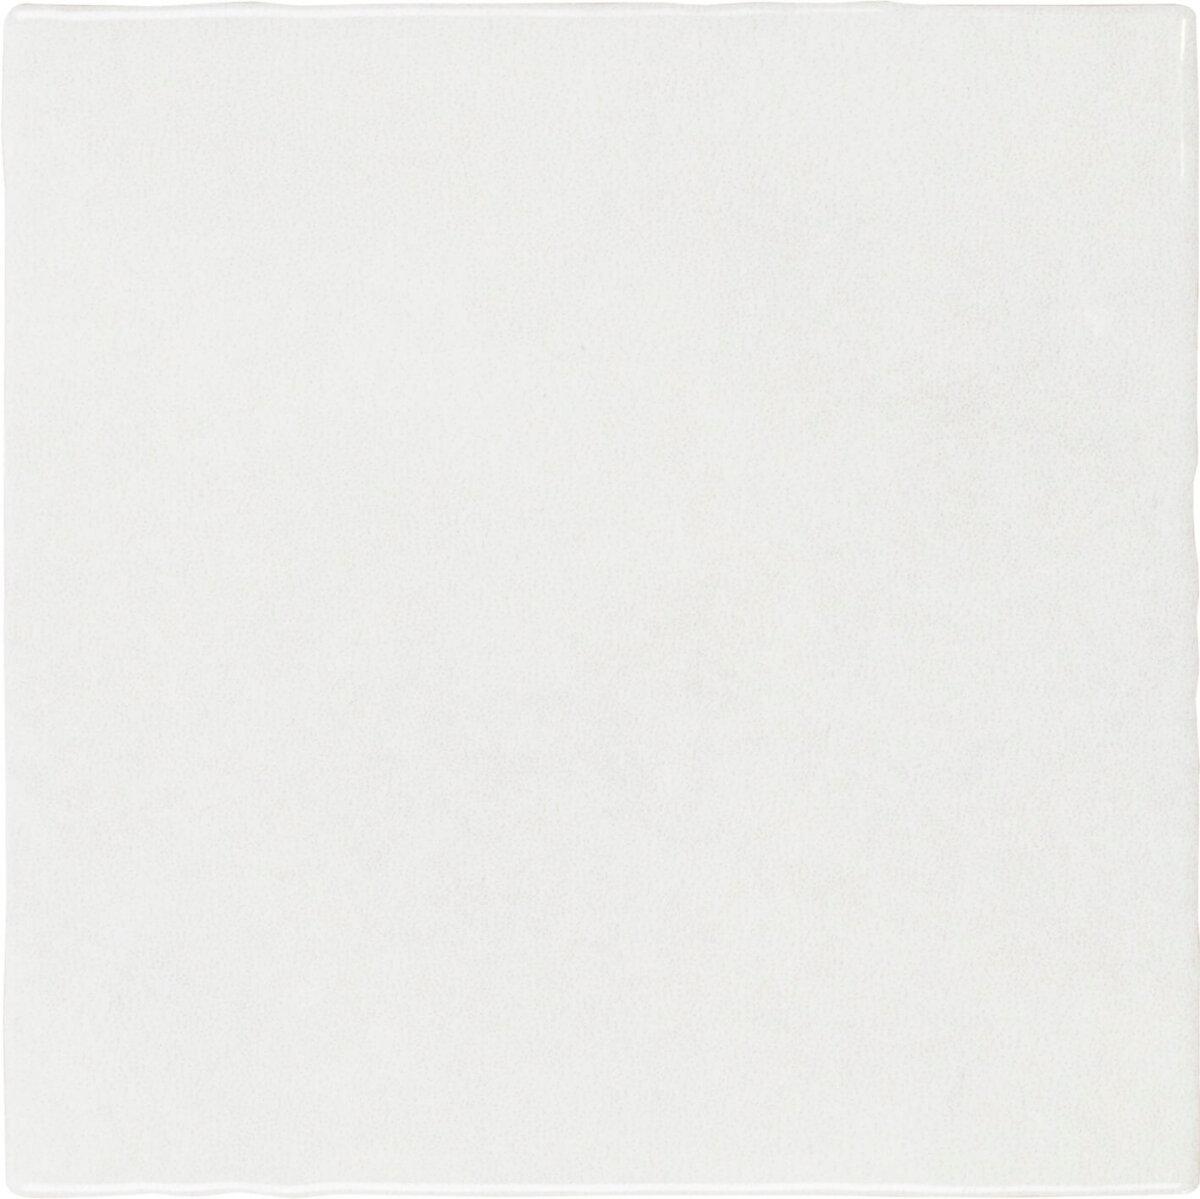 MV Casablanca Quadrato Blanco 120x120mm_Stiles_Product1_Image